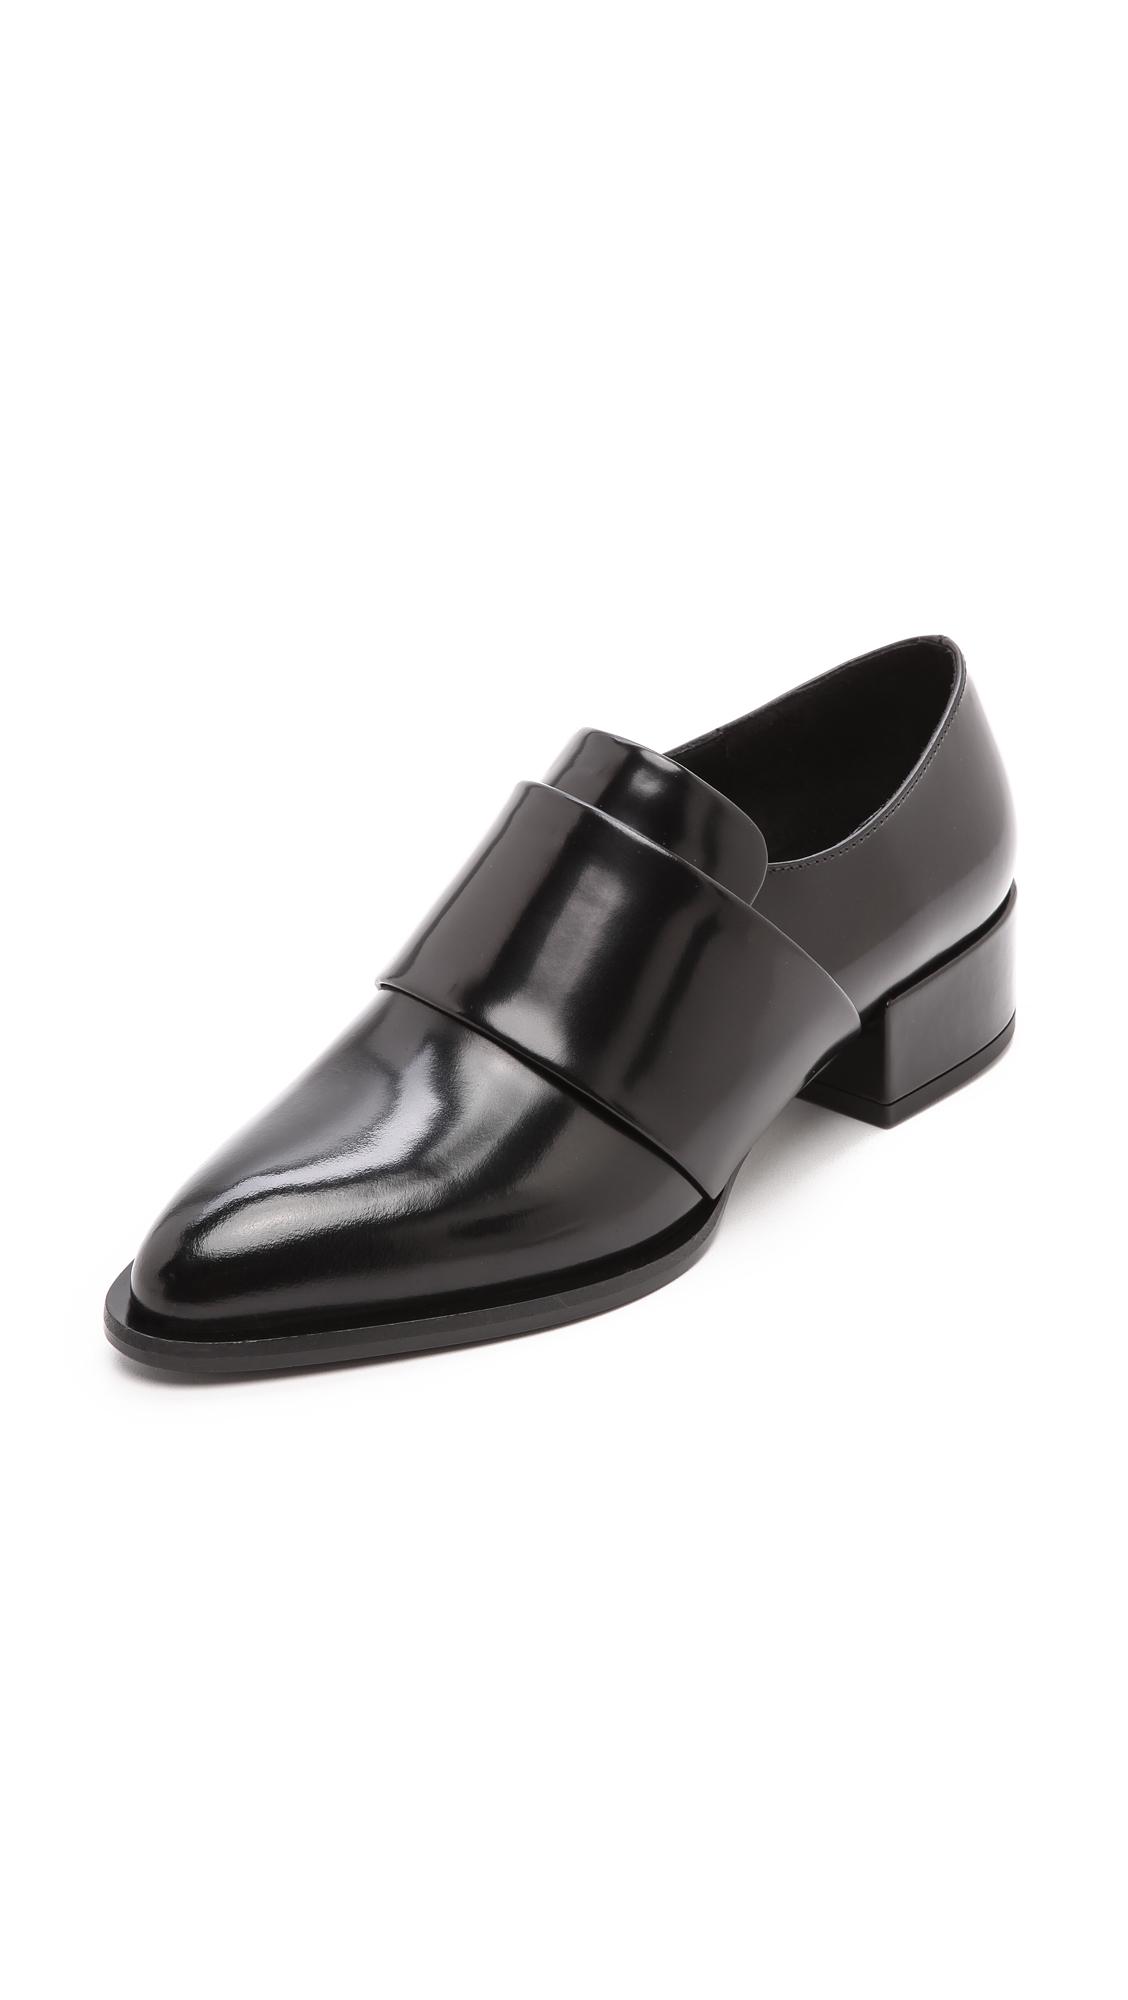 Vince yaeger loafers